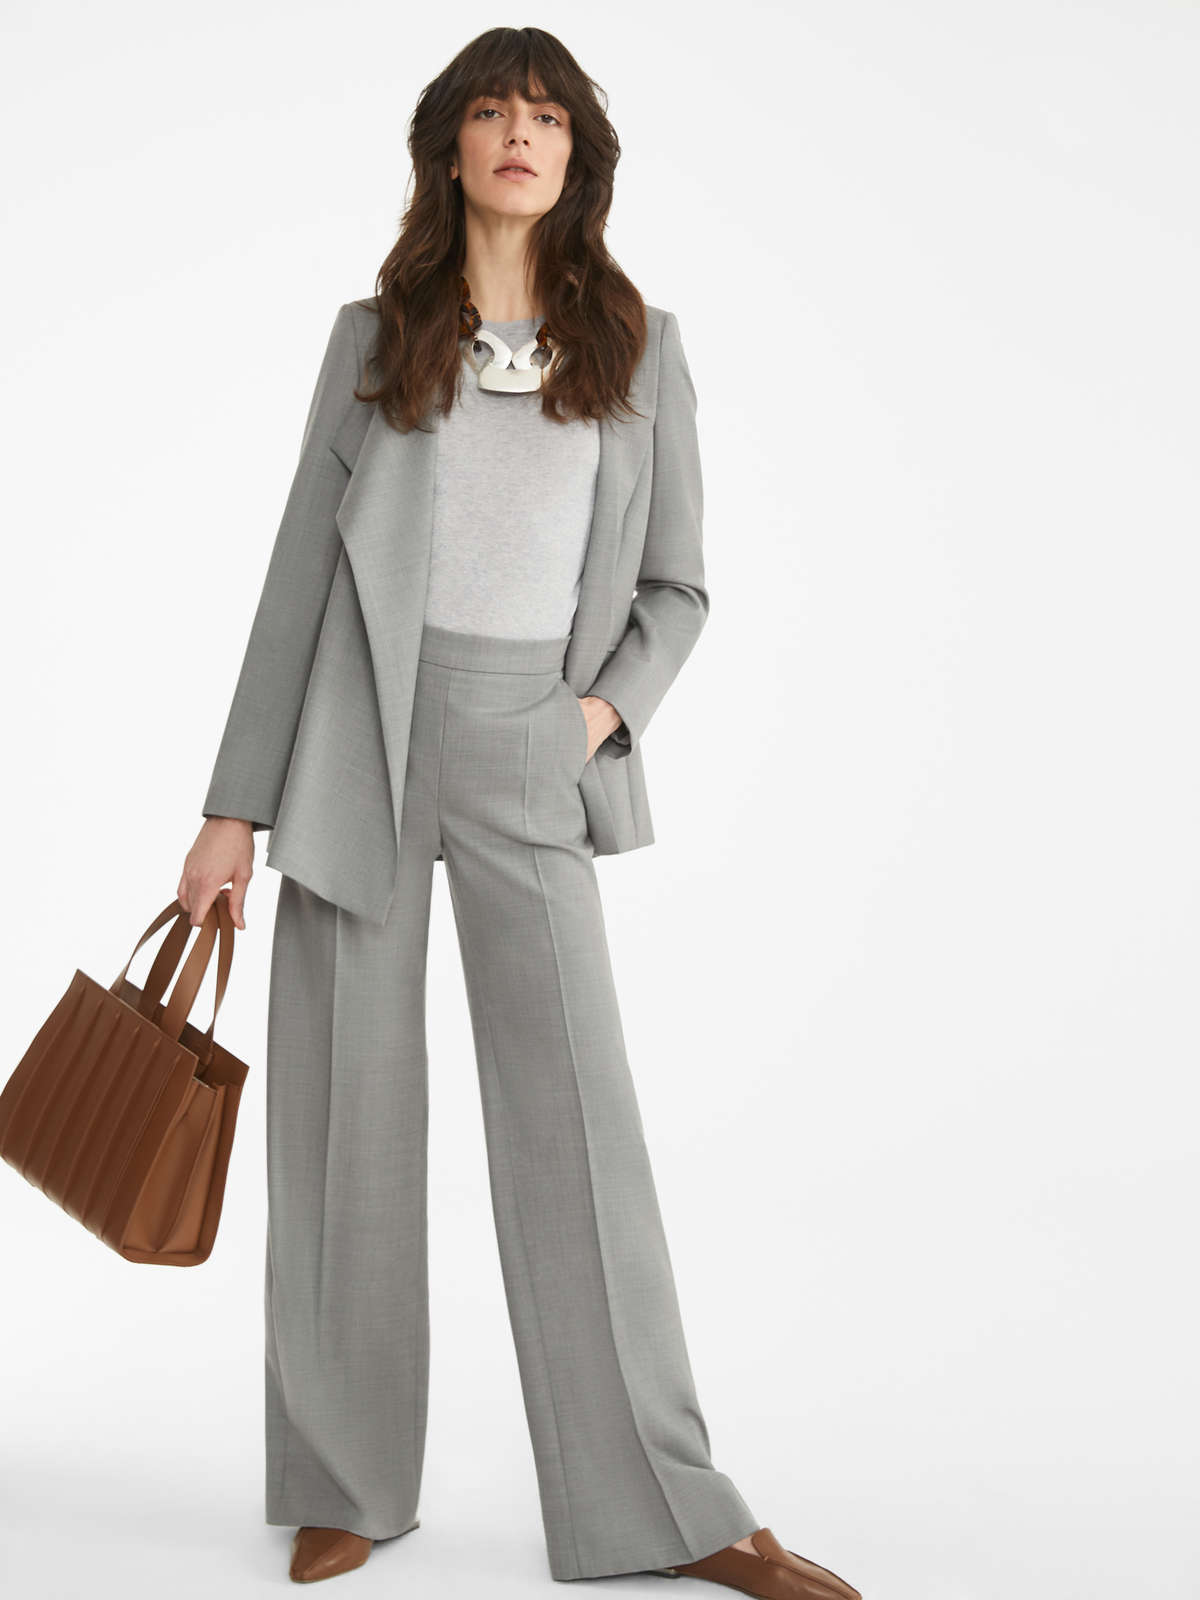 Sweater In Silk And Cashmere Yarn - Max Mara